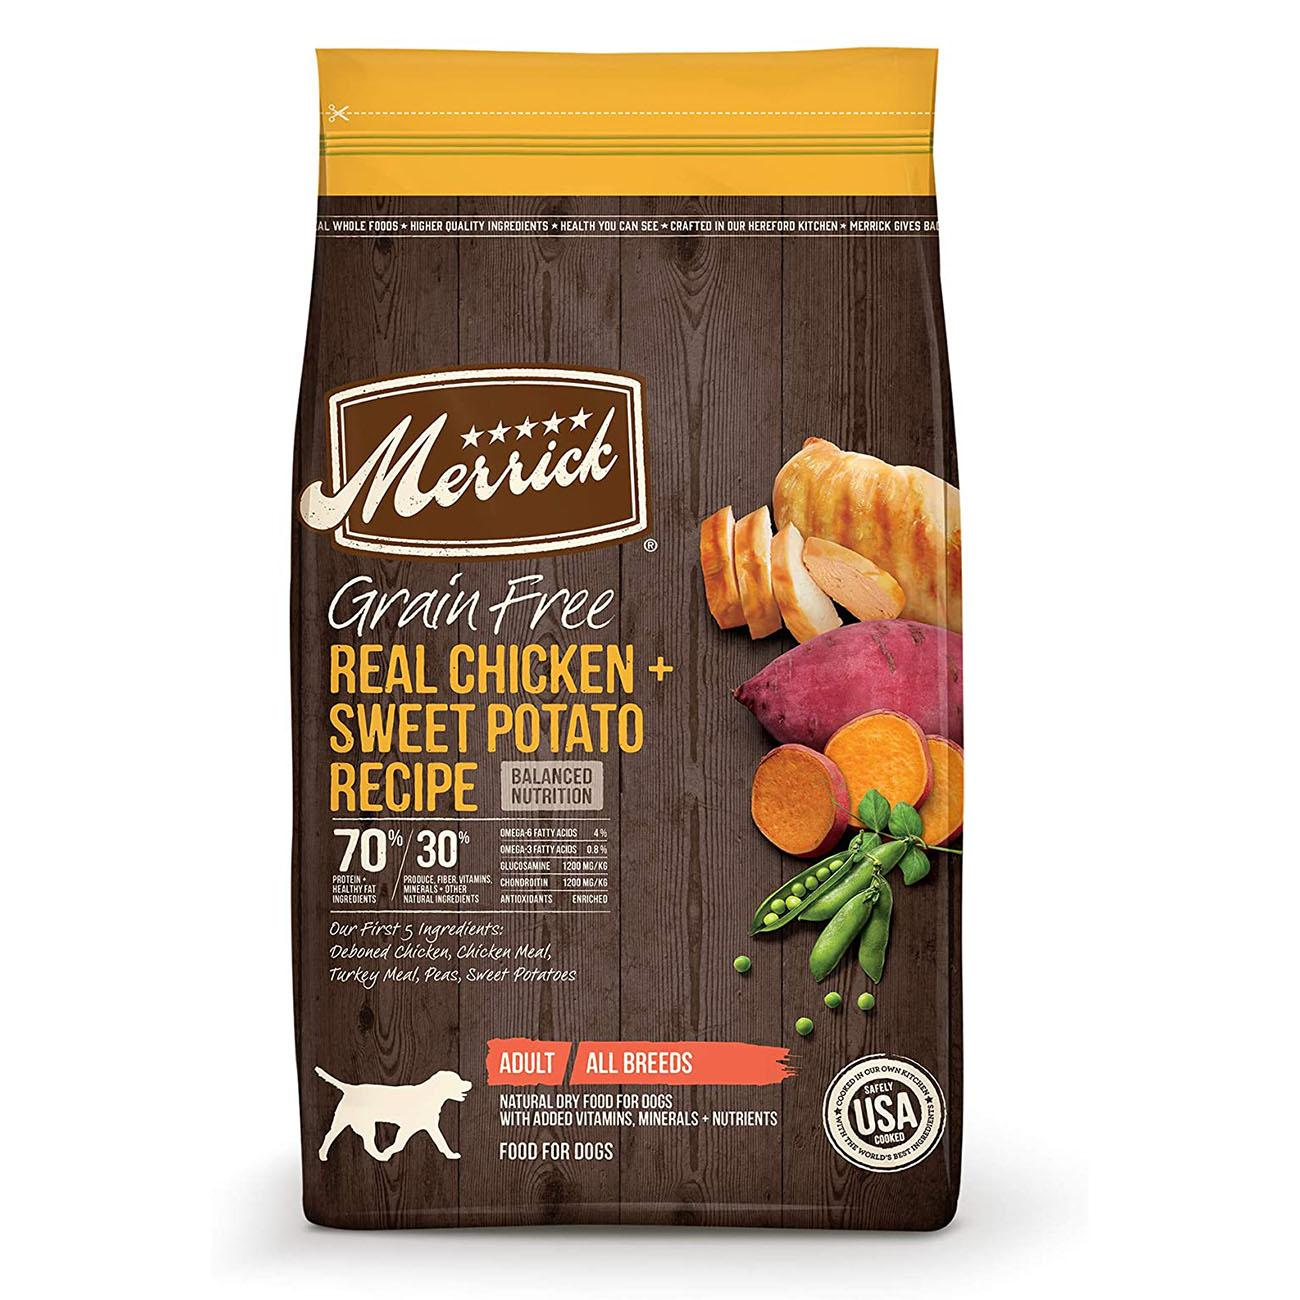 Merrick Grain-Free Dry Dog Food - Real Chicken & Sweet Potato Recipe